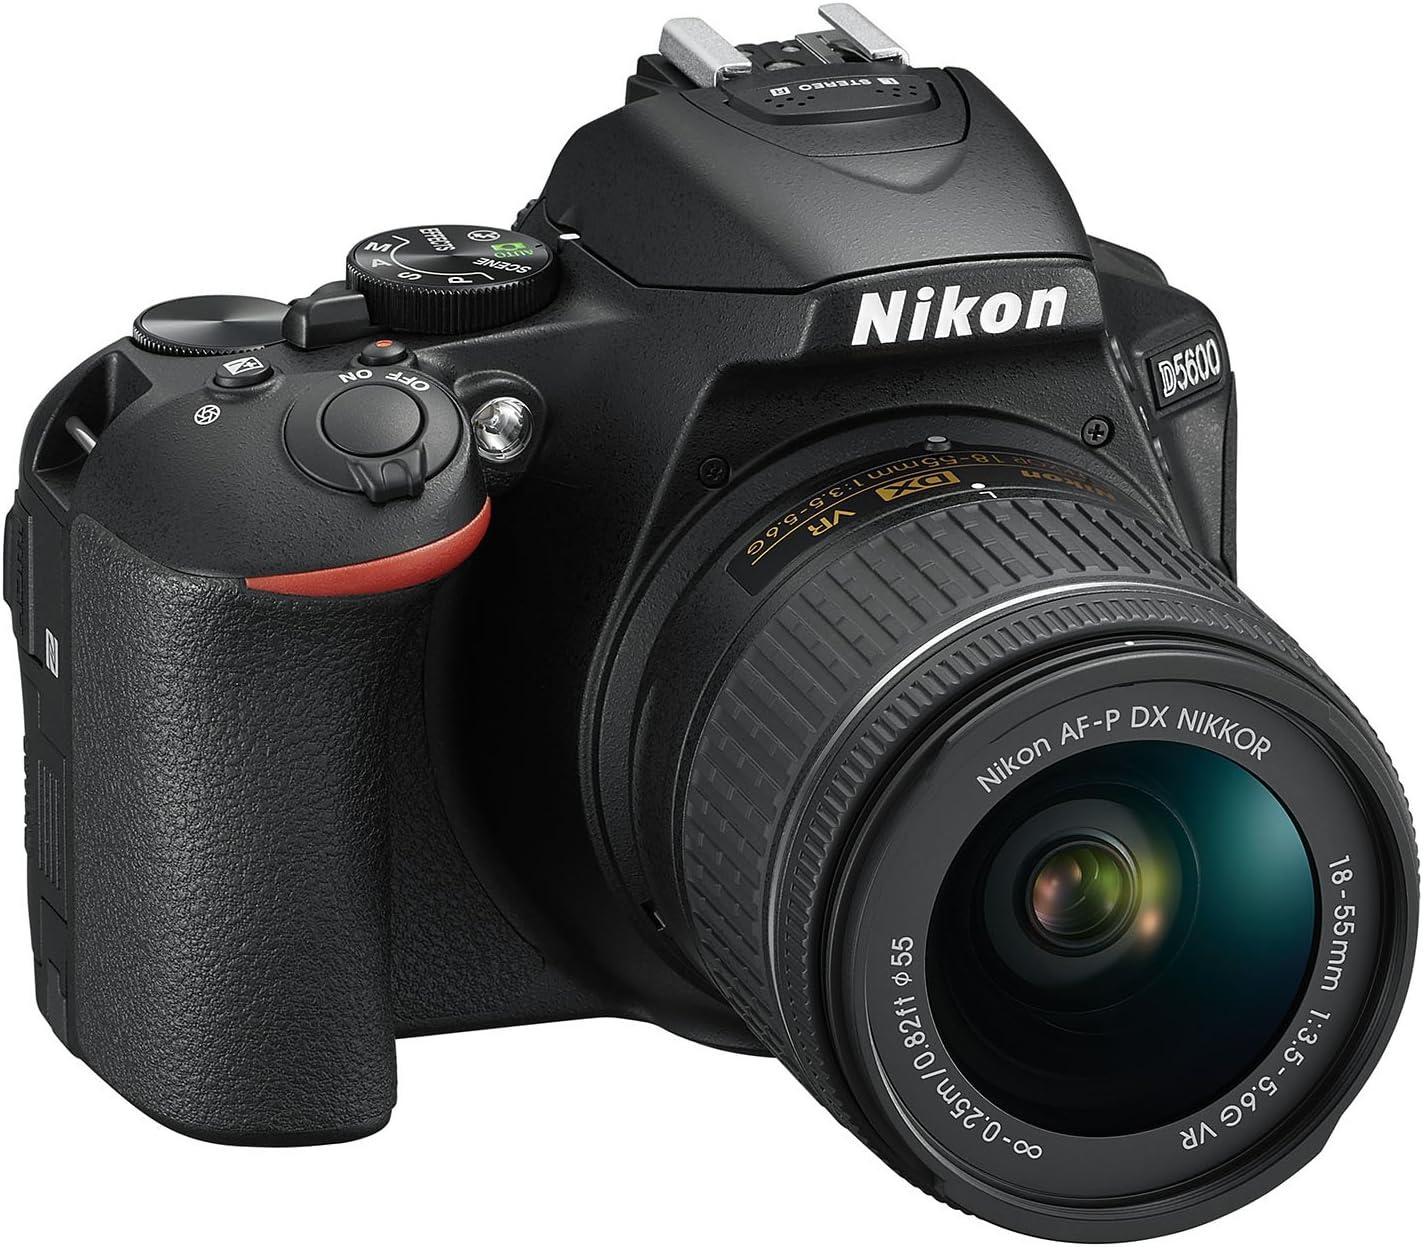 Nikon D5600 + AF-P DX 18-55mm VR + 8GB SD Juego de cámara SLR 24,2 ...